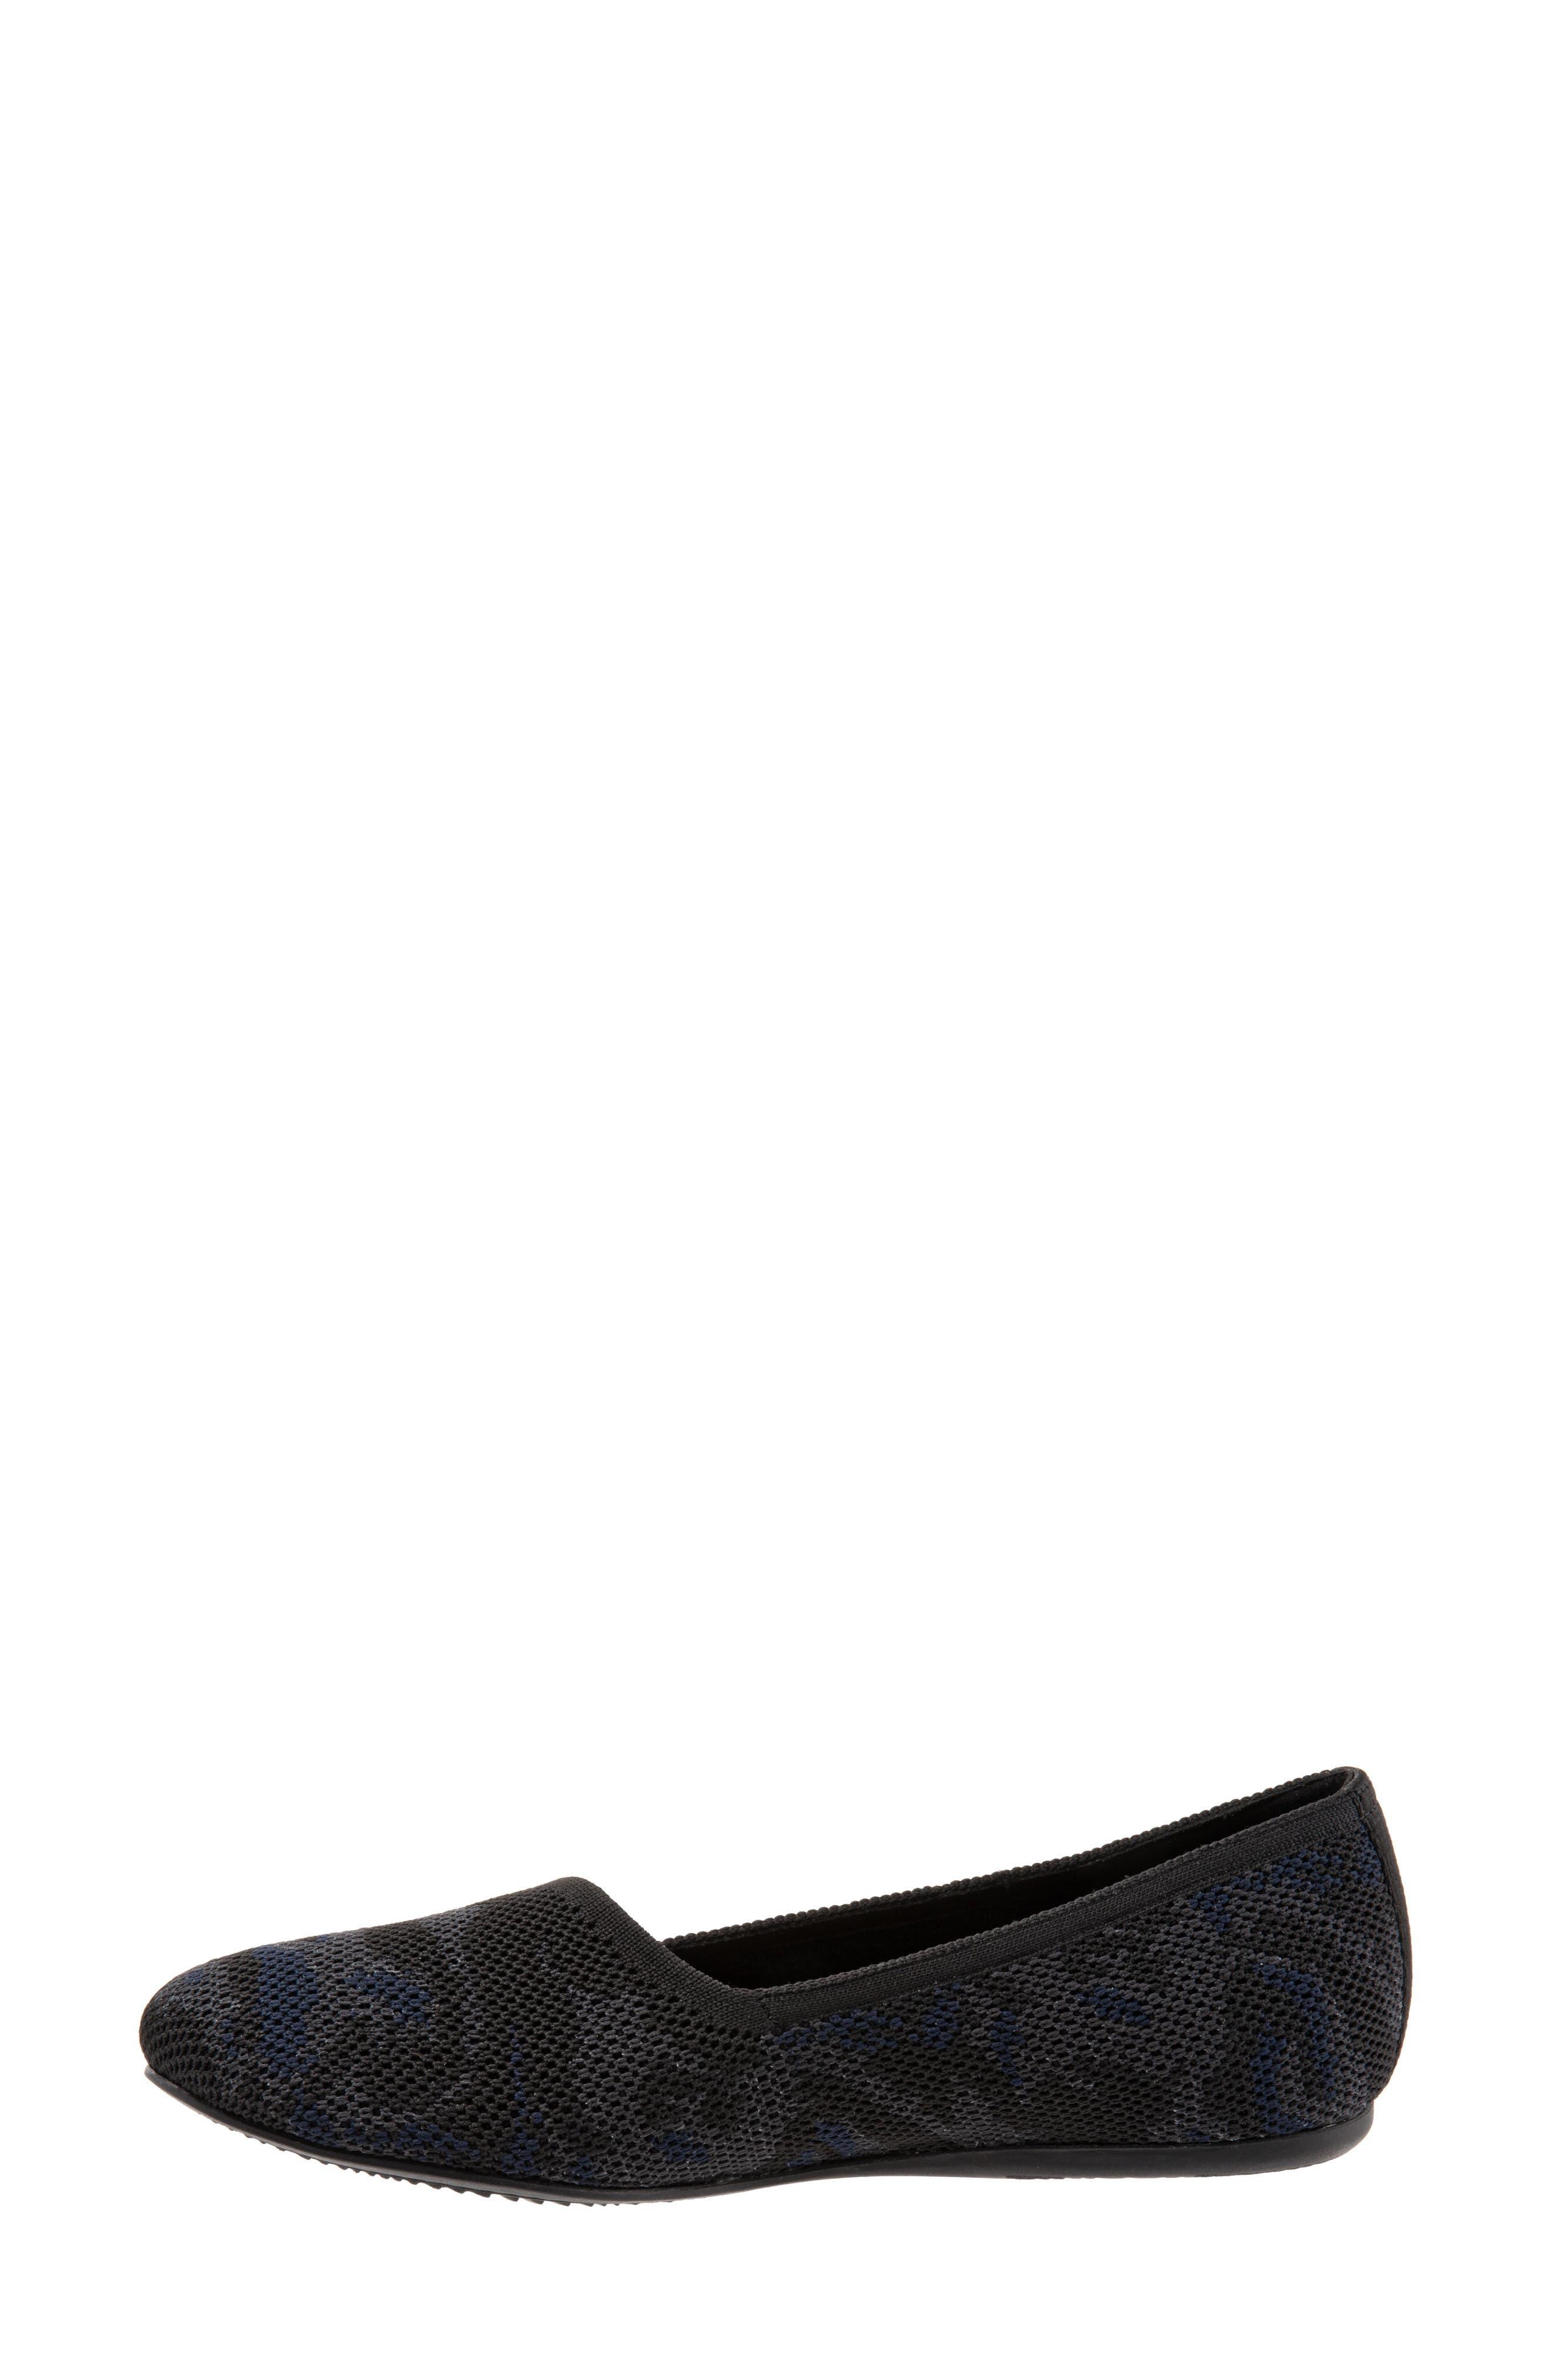 SOFTWALK<SUP>®</SUP>, Sicily Knit Flat, Alternate thumbnail 8, color, BLACK/ GREY FABRIC